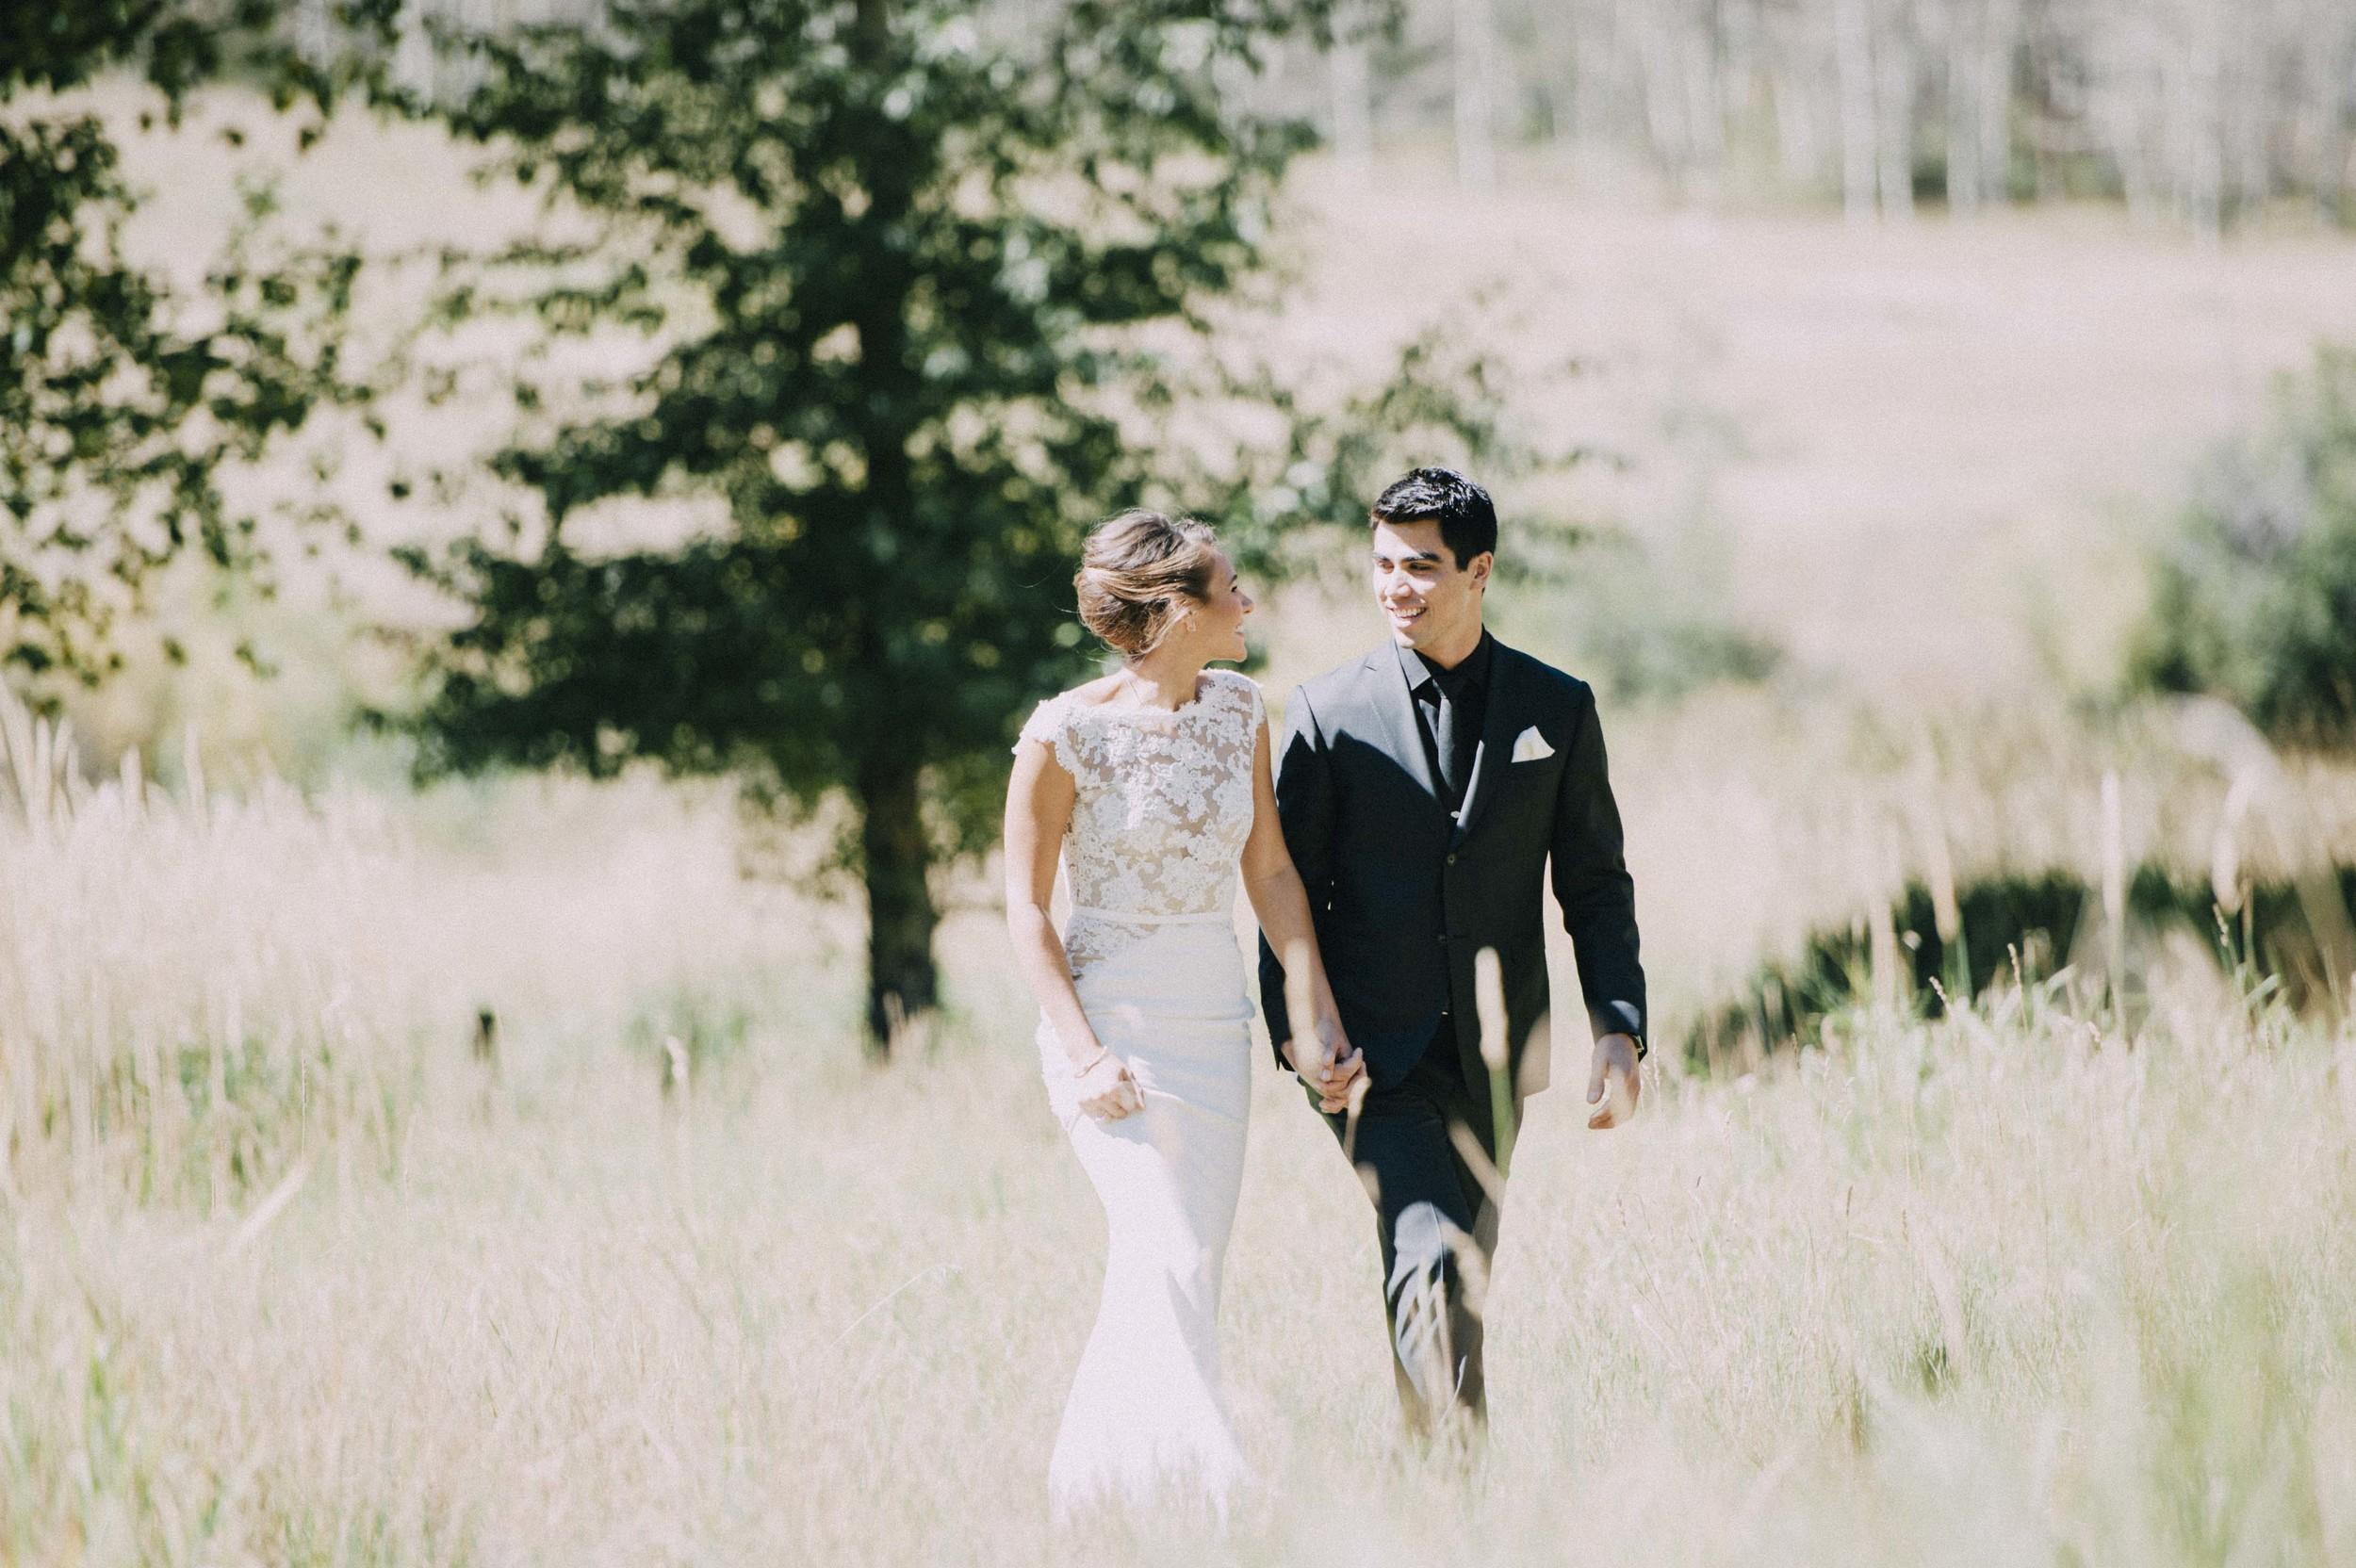 SashaBreton_wedding-2950.jpg